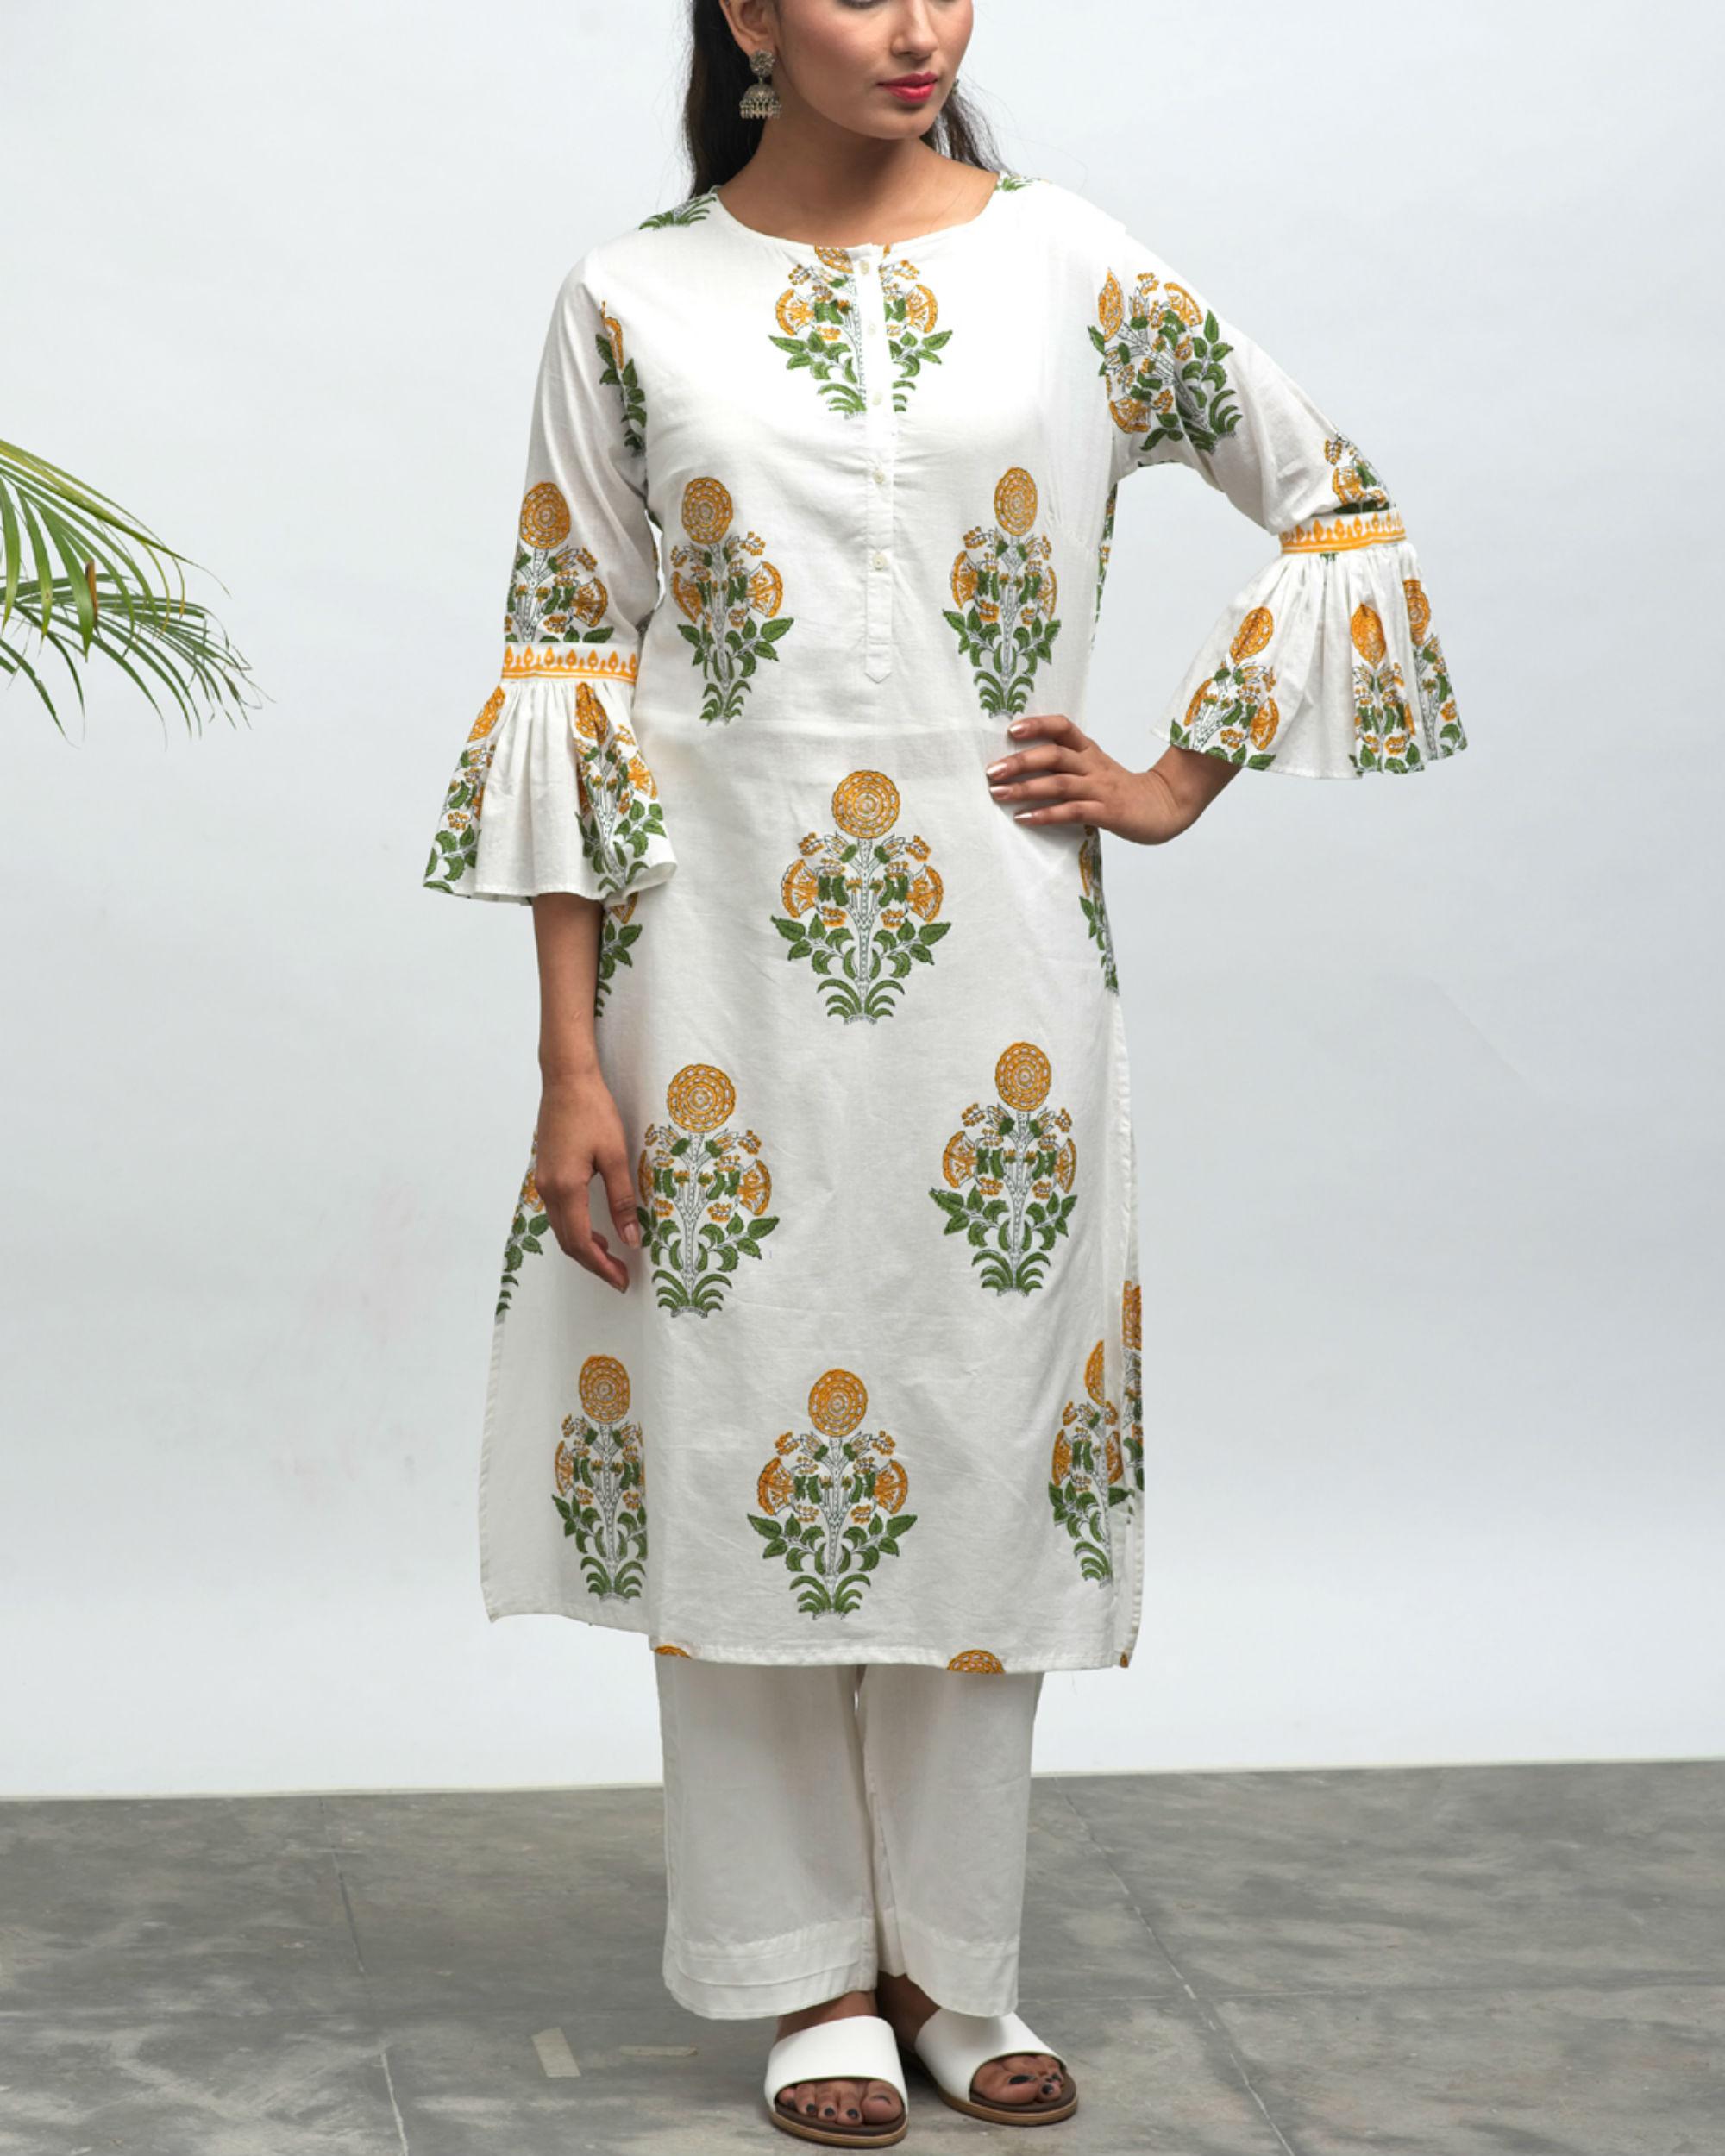 Roohi hand block printed kurta pant set